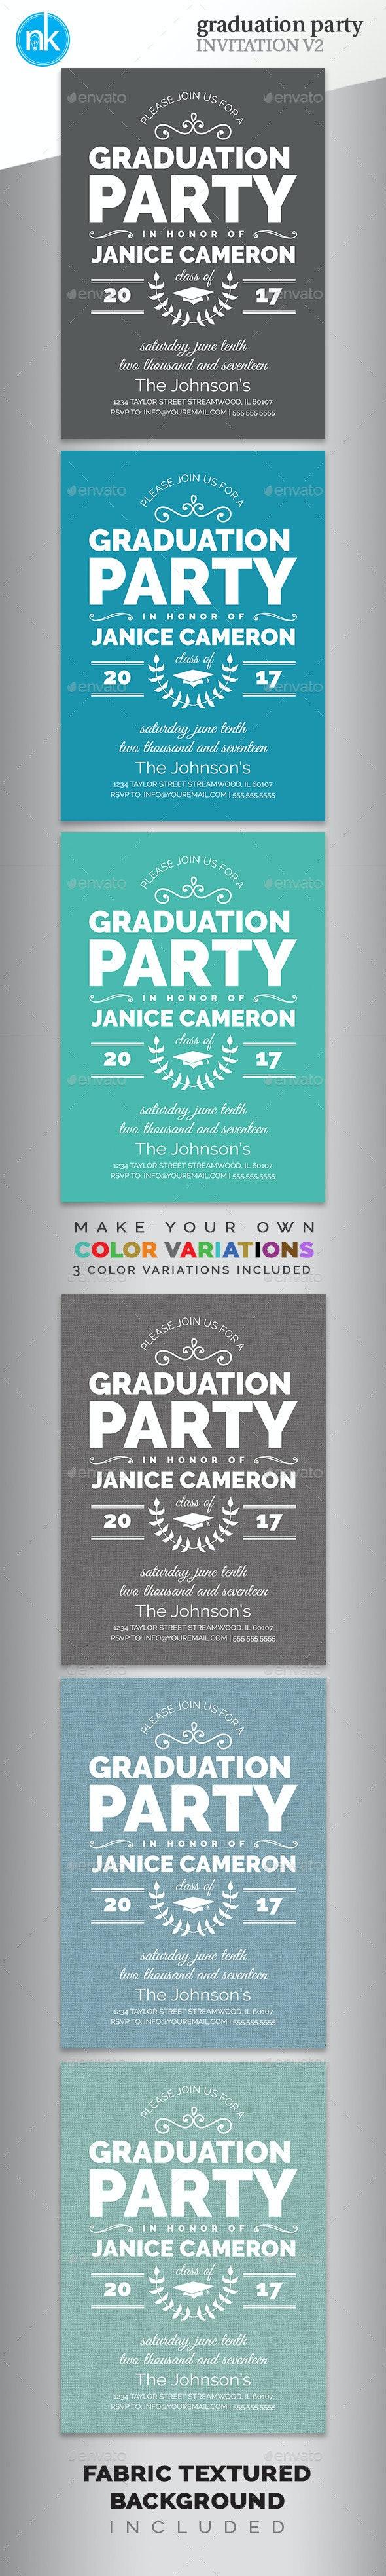 Graduation Party Invitation V2 - Invitations Cards & Invites